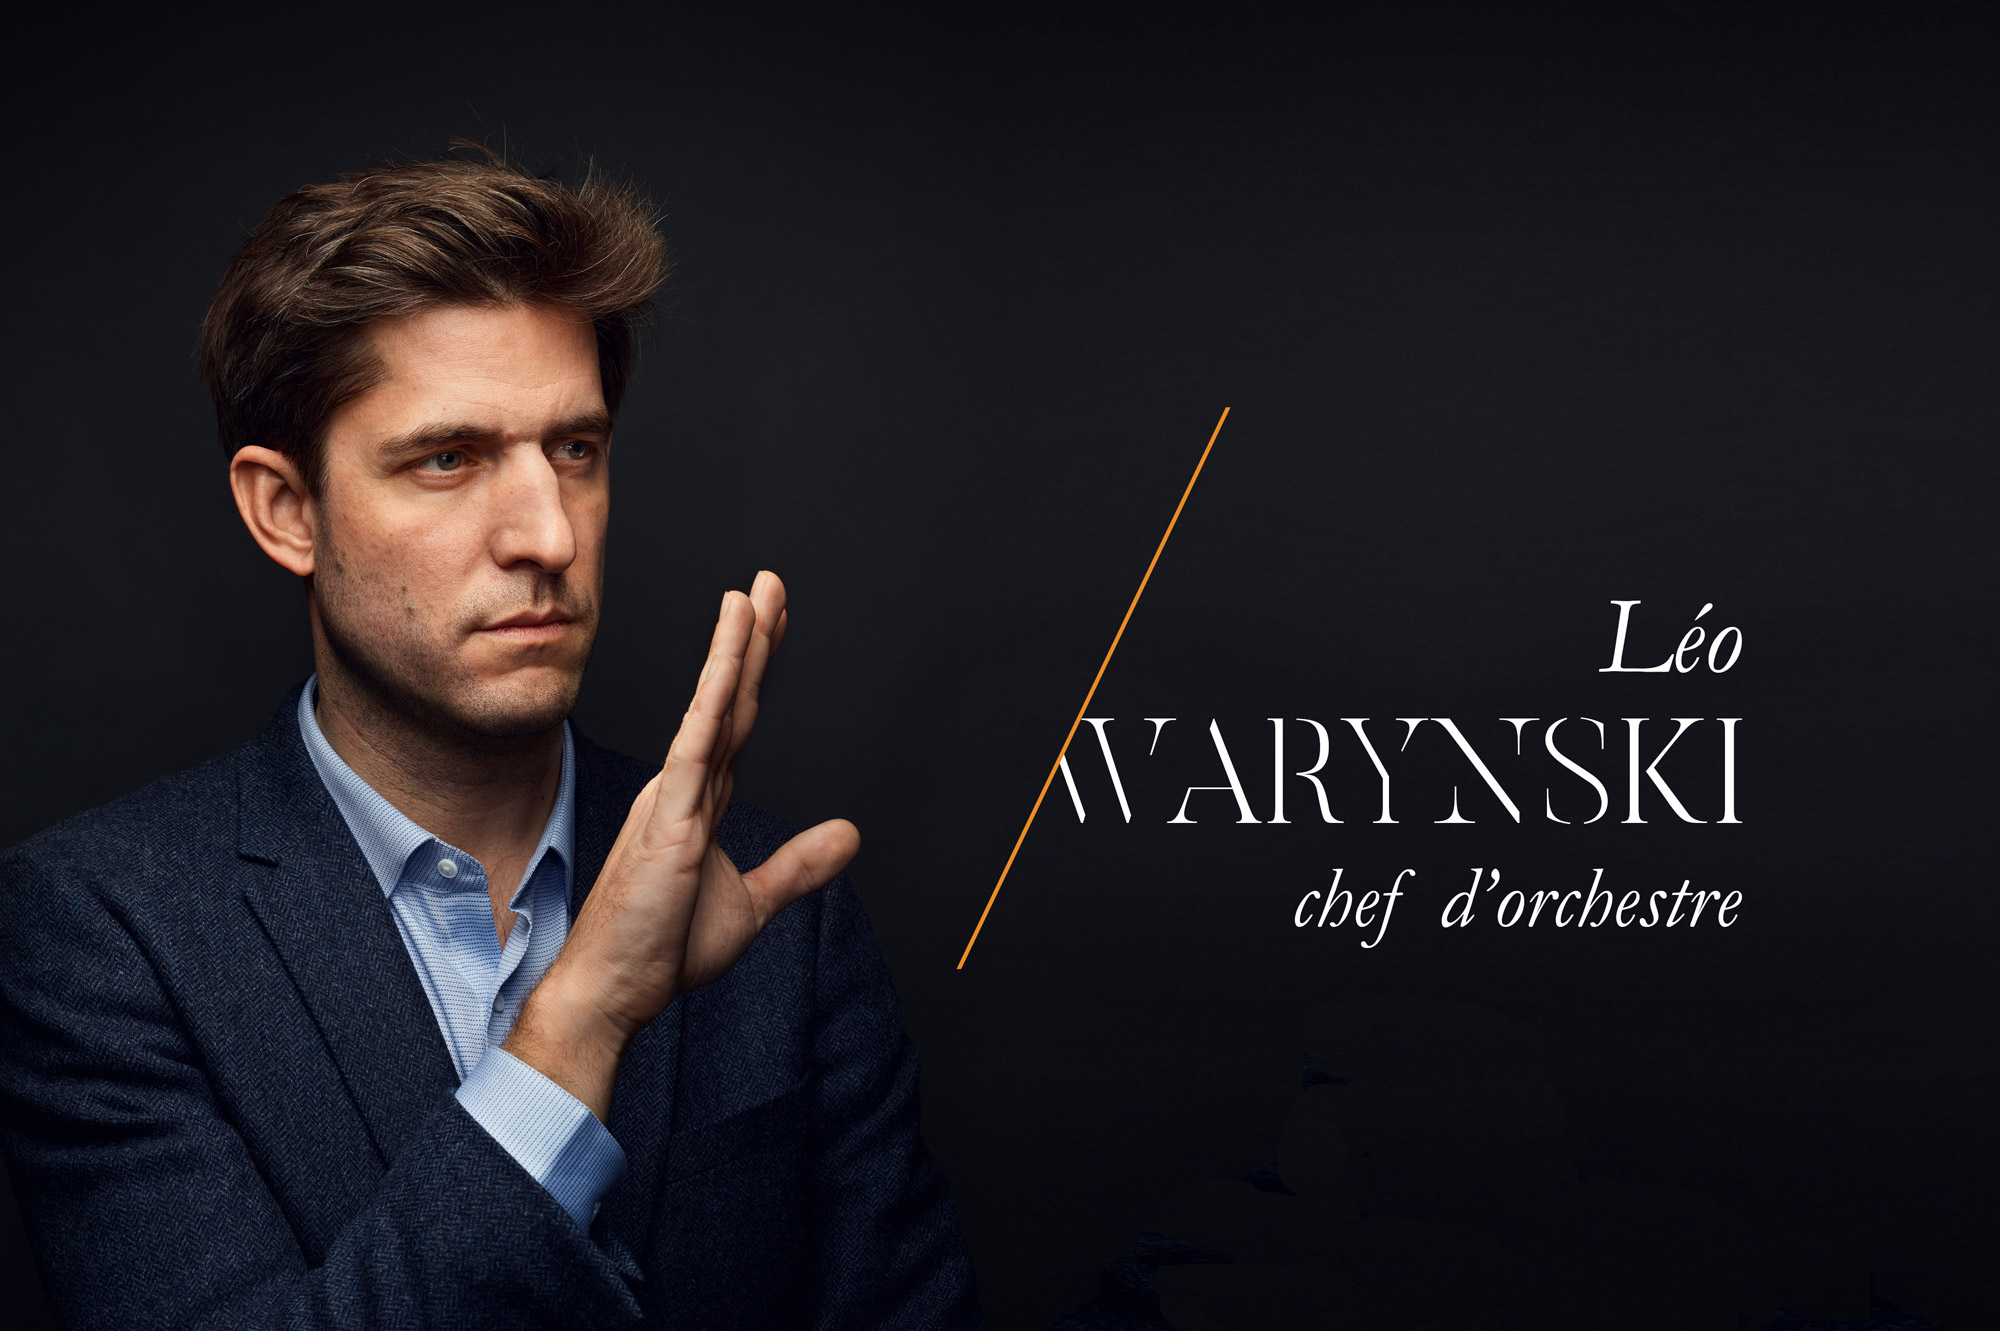 LEO-WARYNSKI-header-agence-ysee